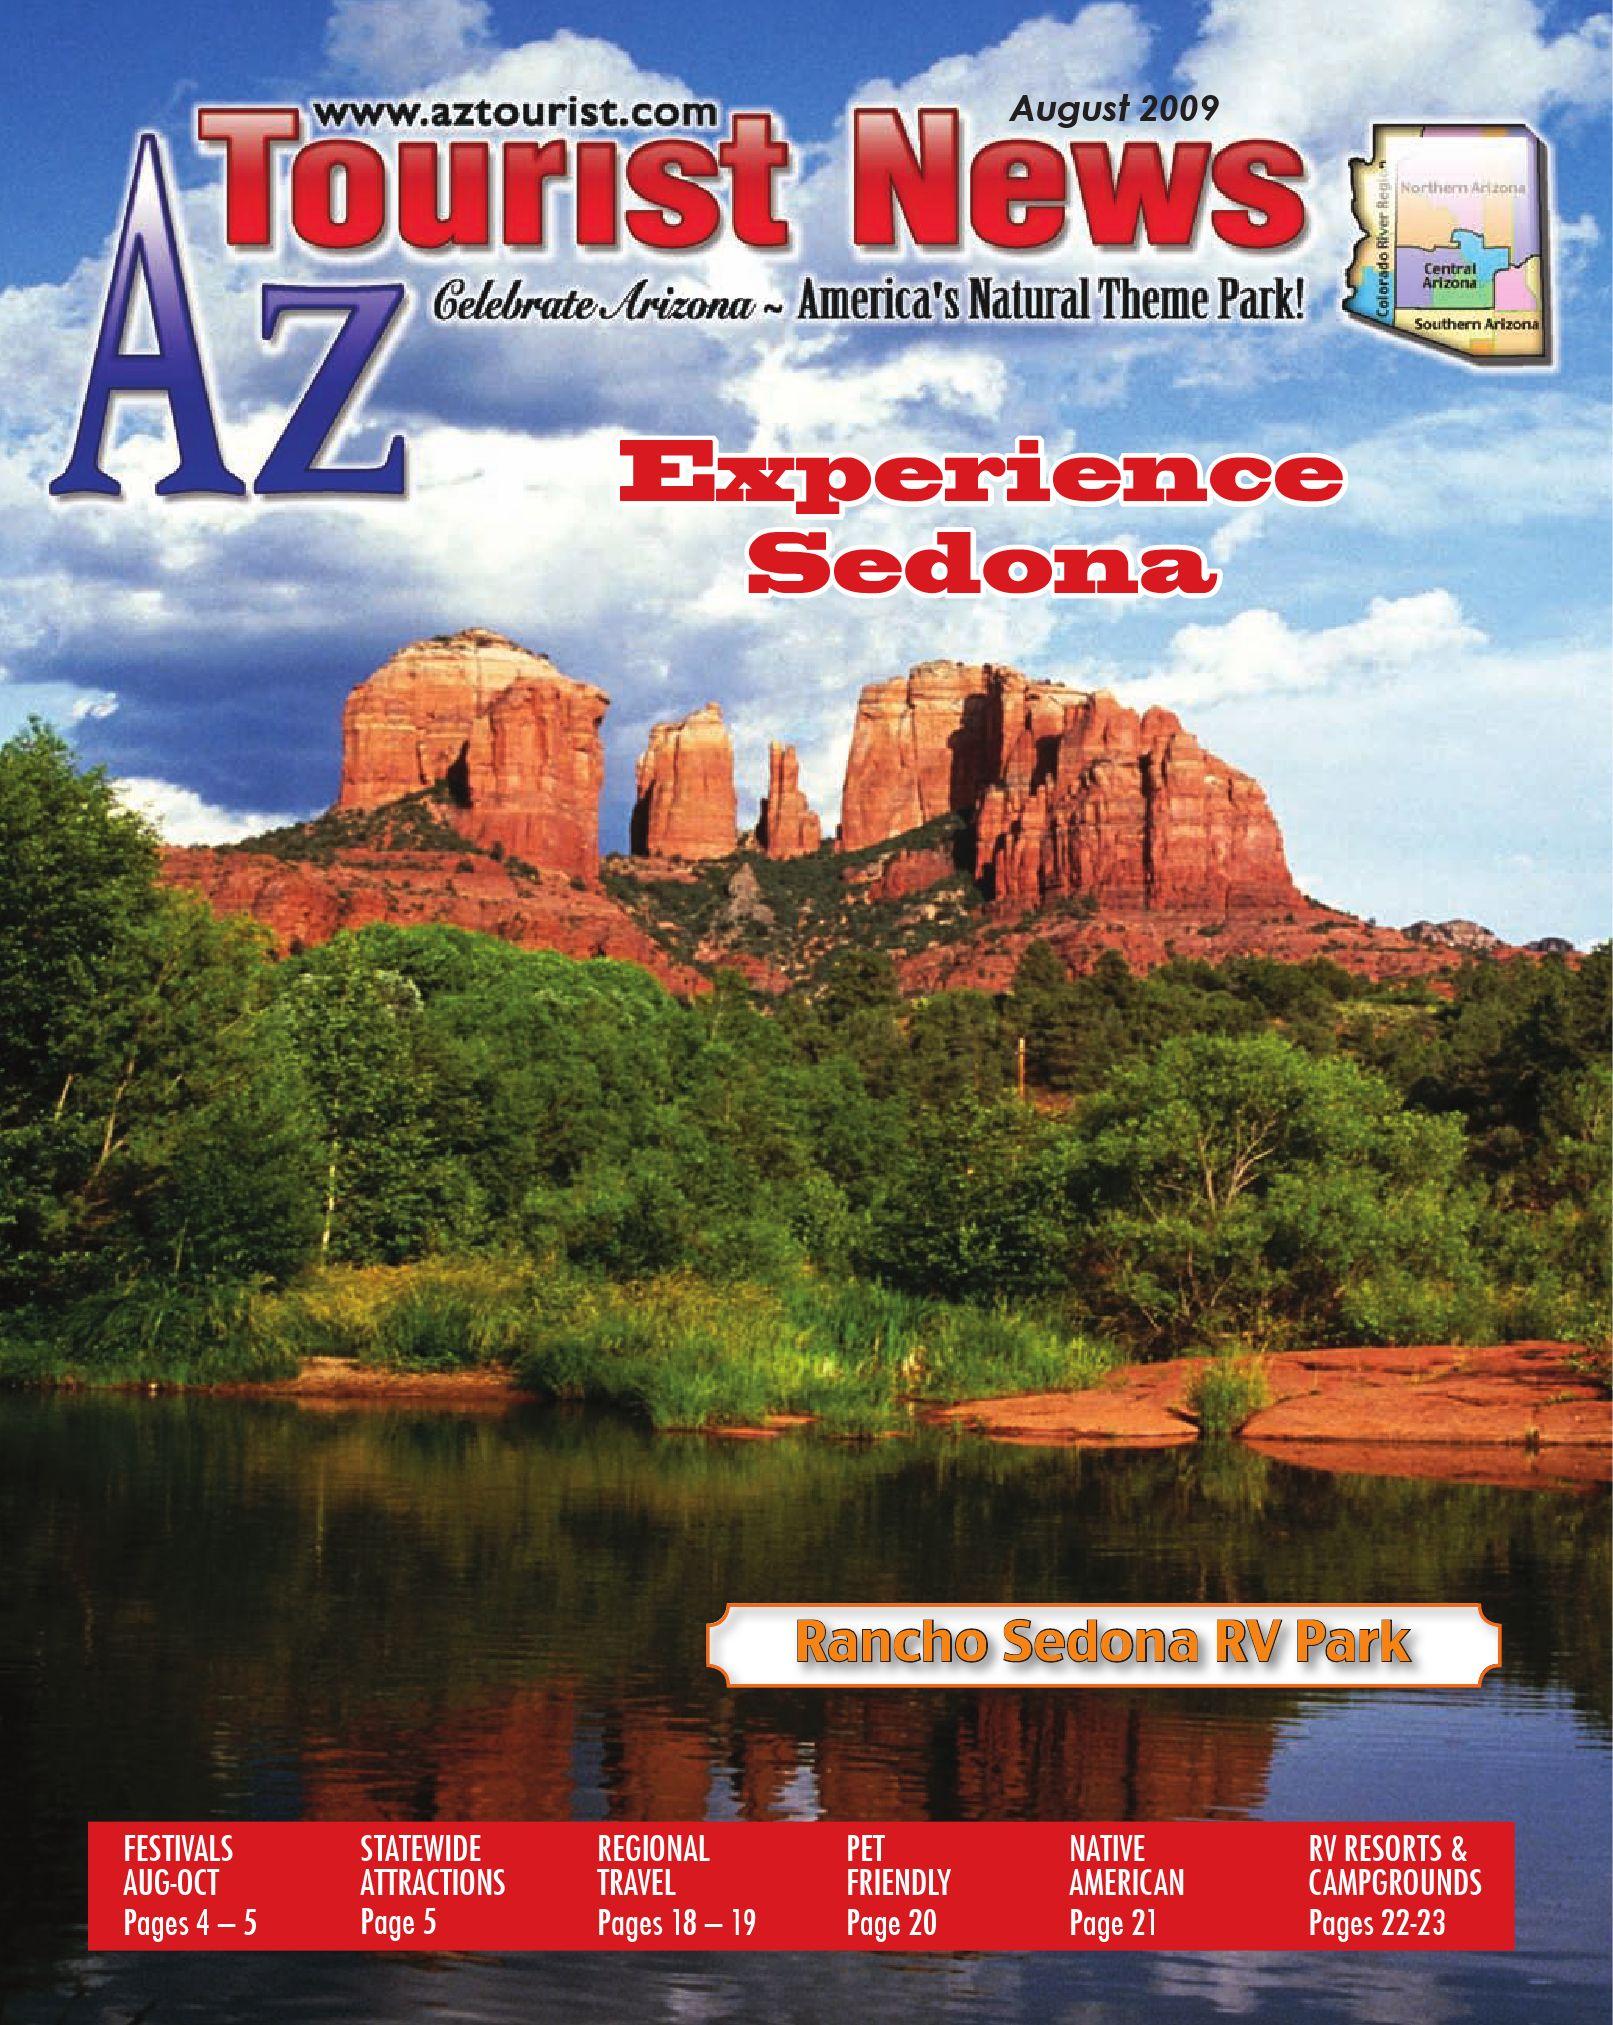 AzTourist August 2009 by Az Tourist News - issuu